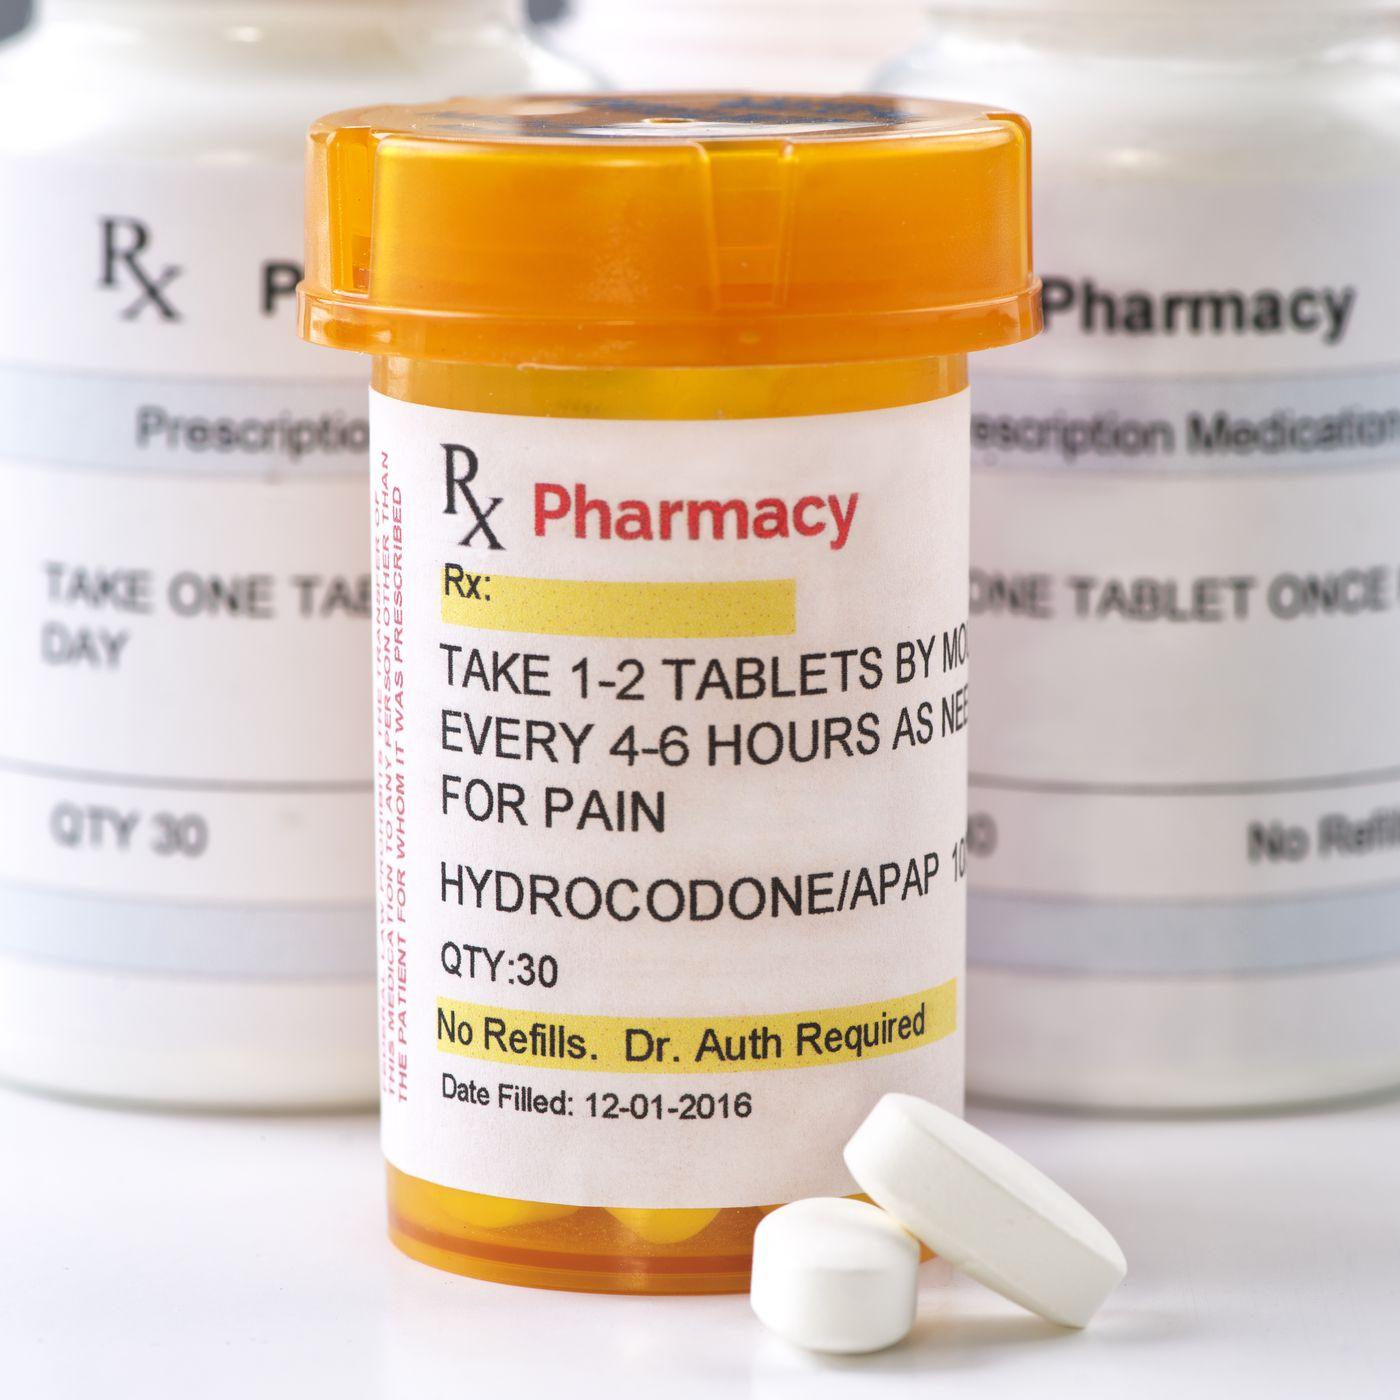 Post dating narcotic prescriptions